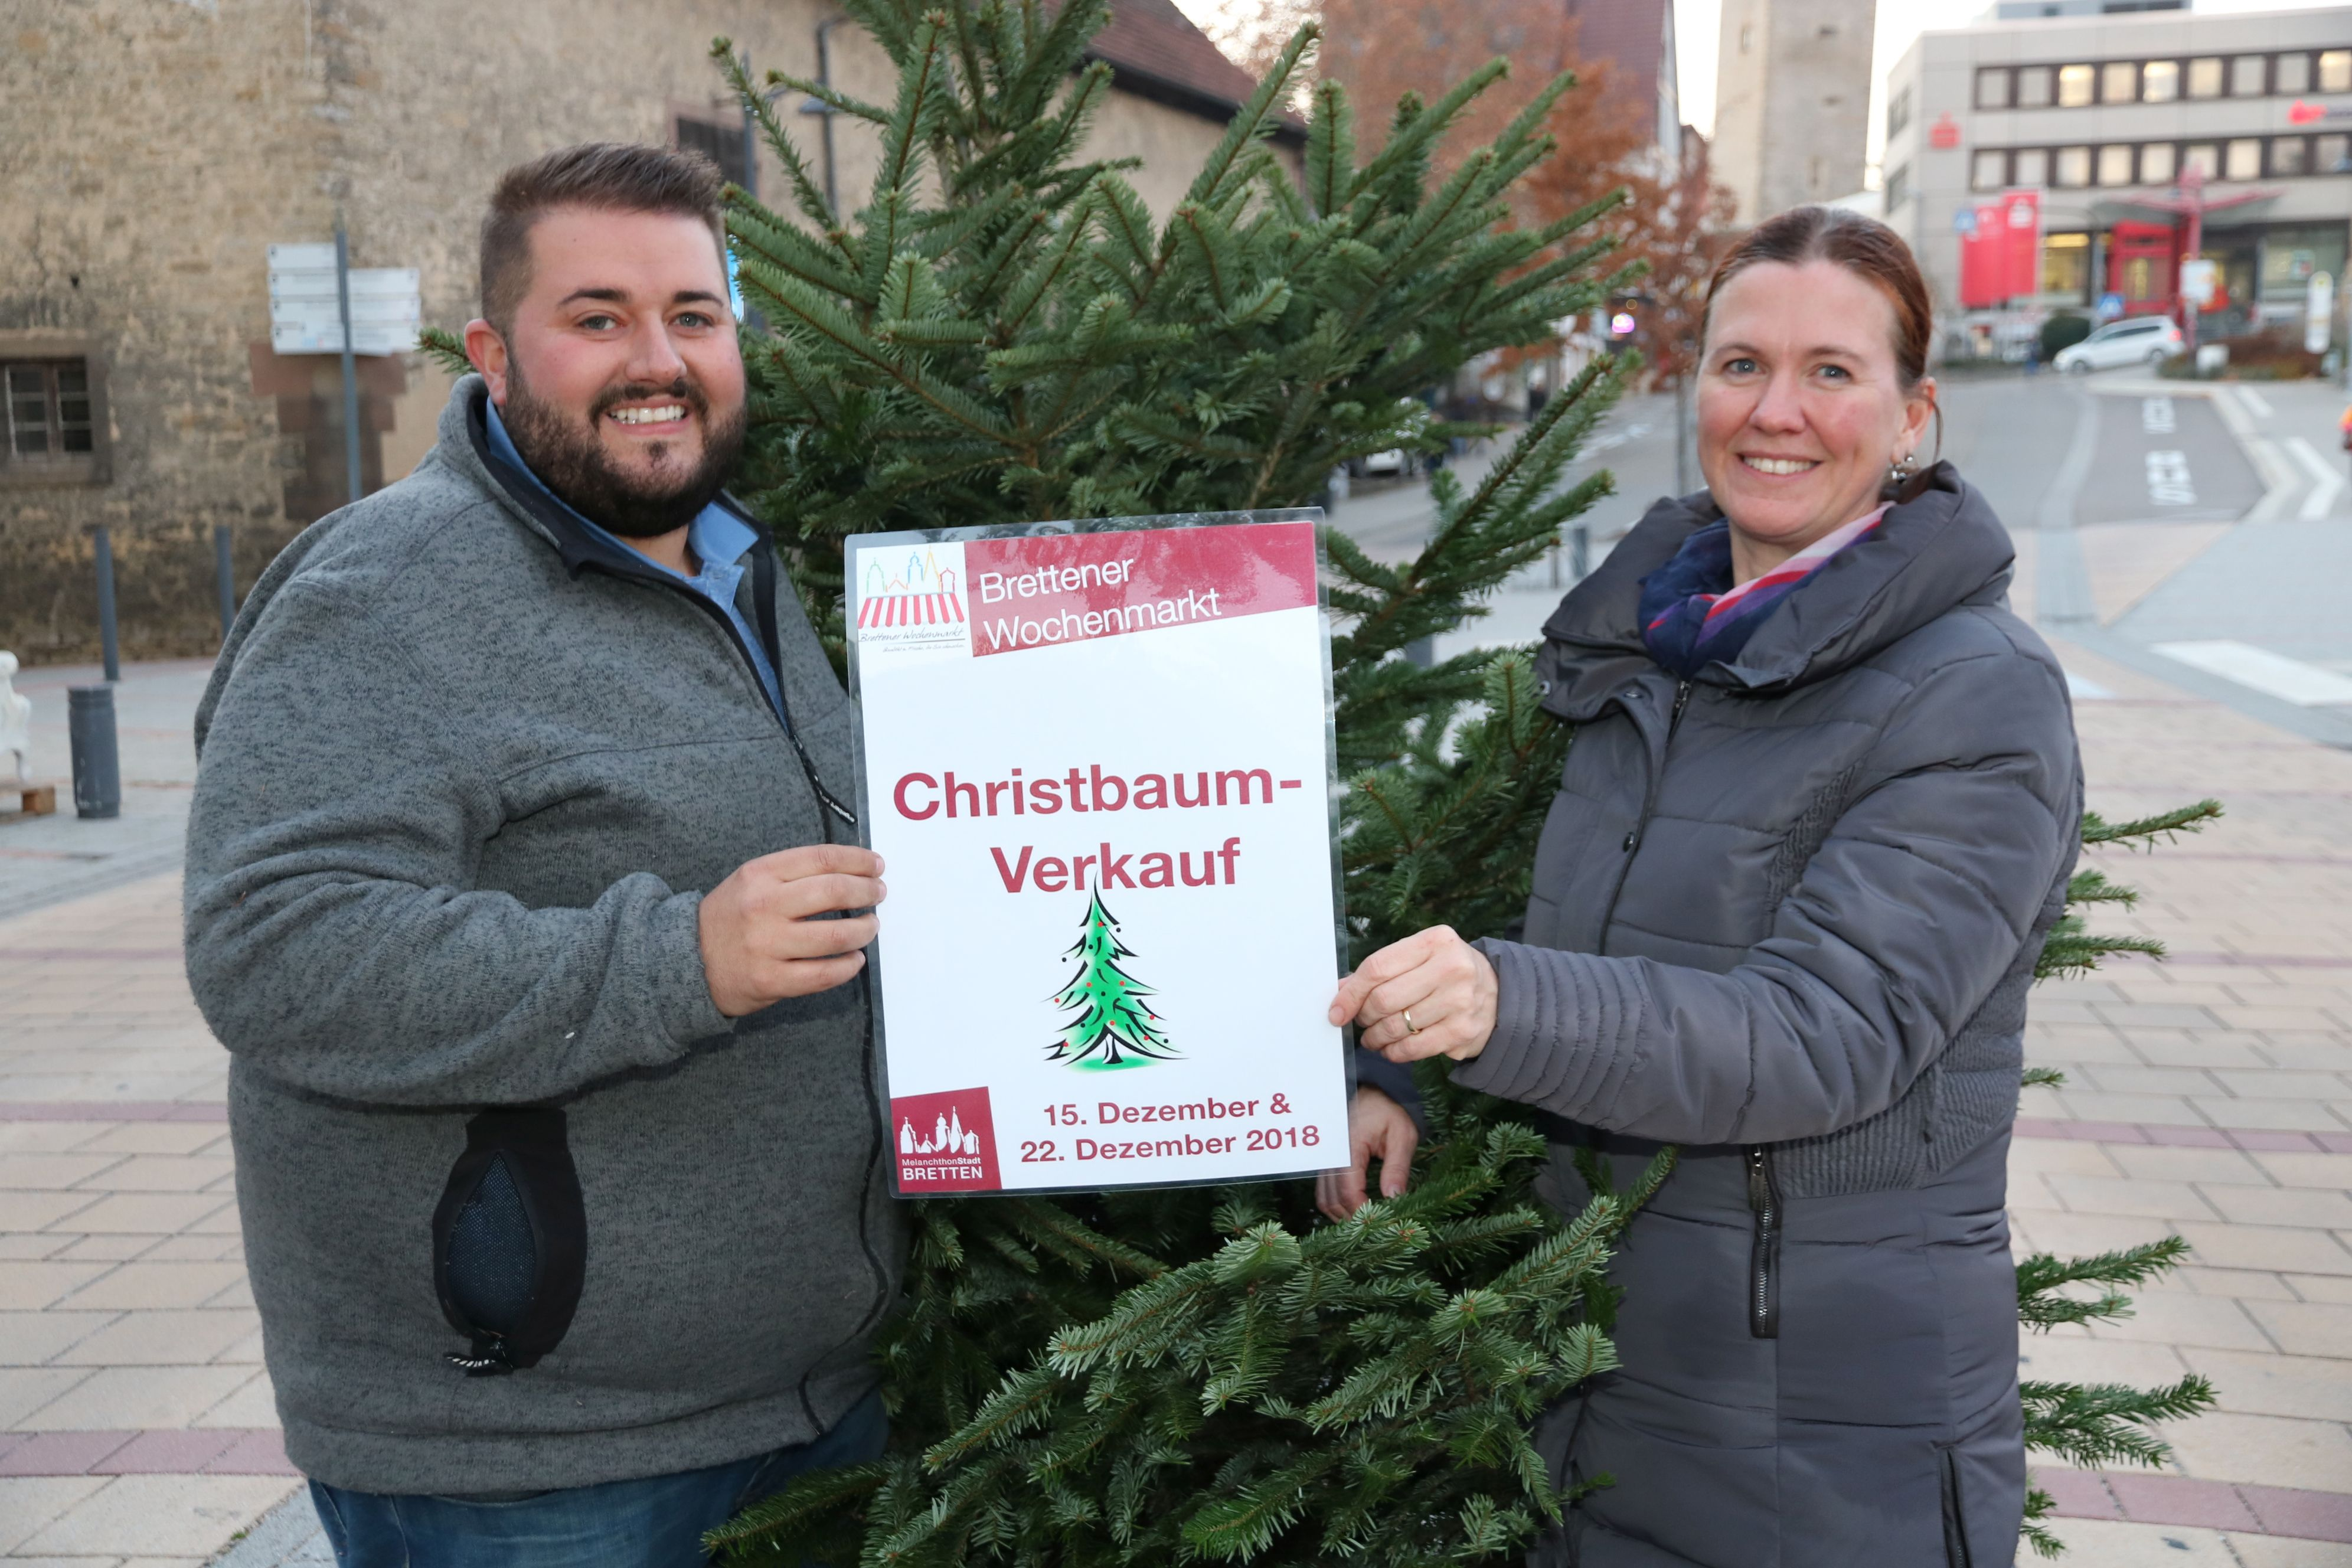 Christbaum-Verkauf